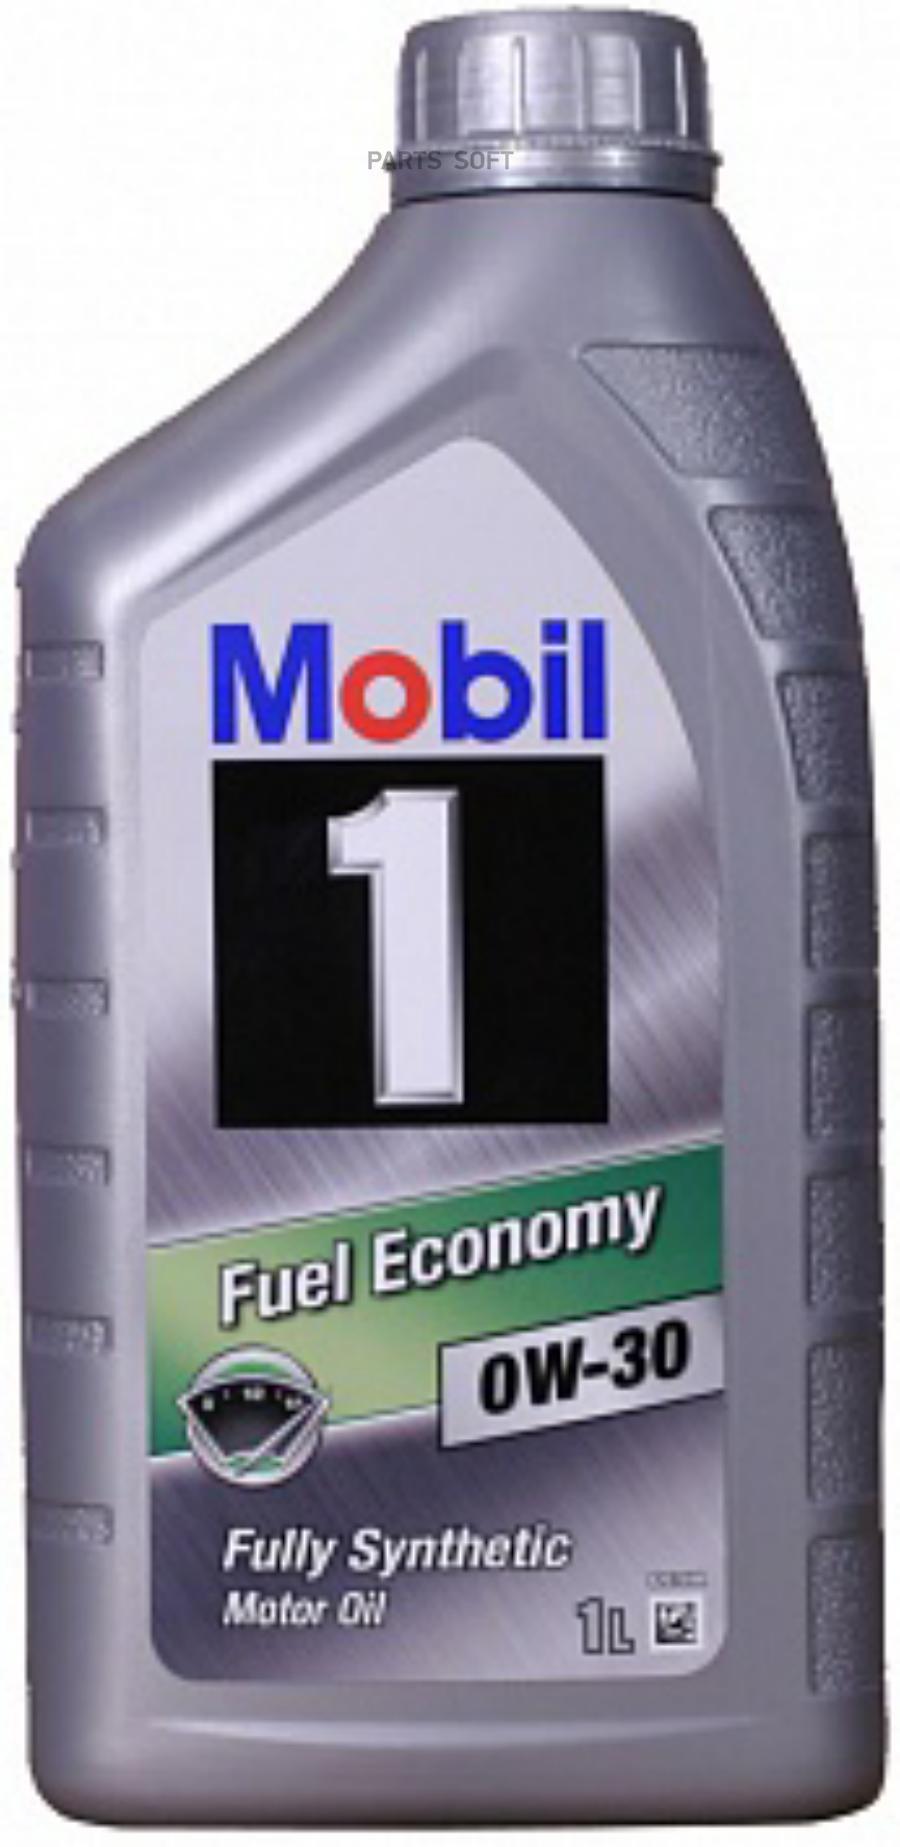 Моторное масло MOBIL 1 Fuel Economy 0W-30 1L